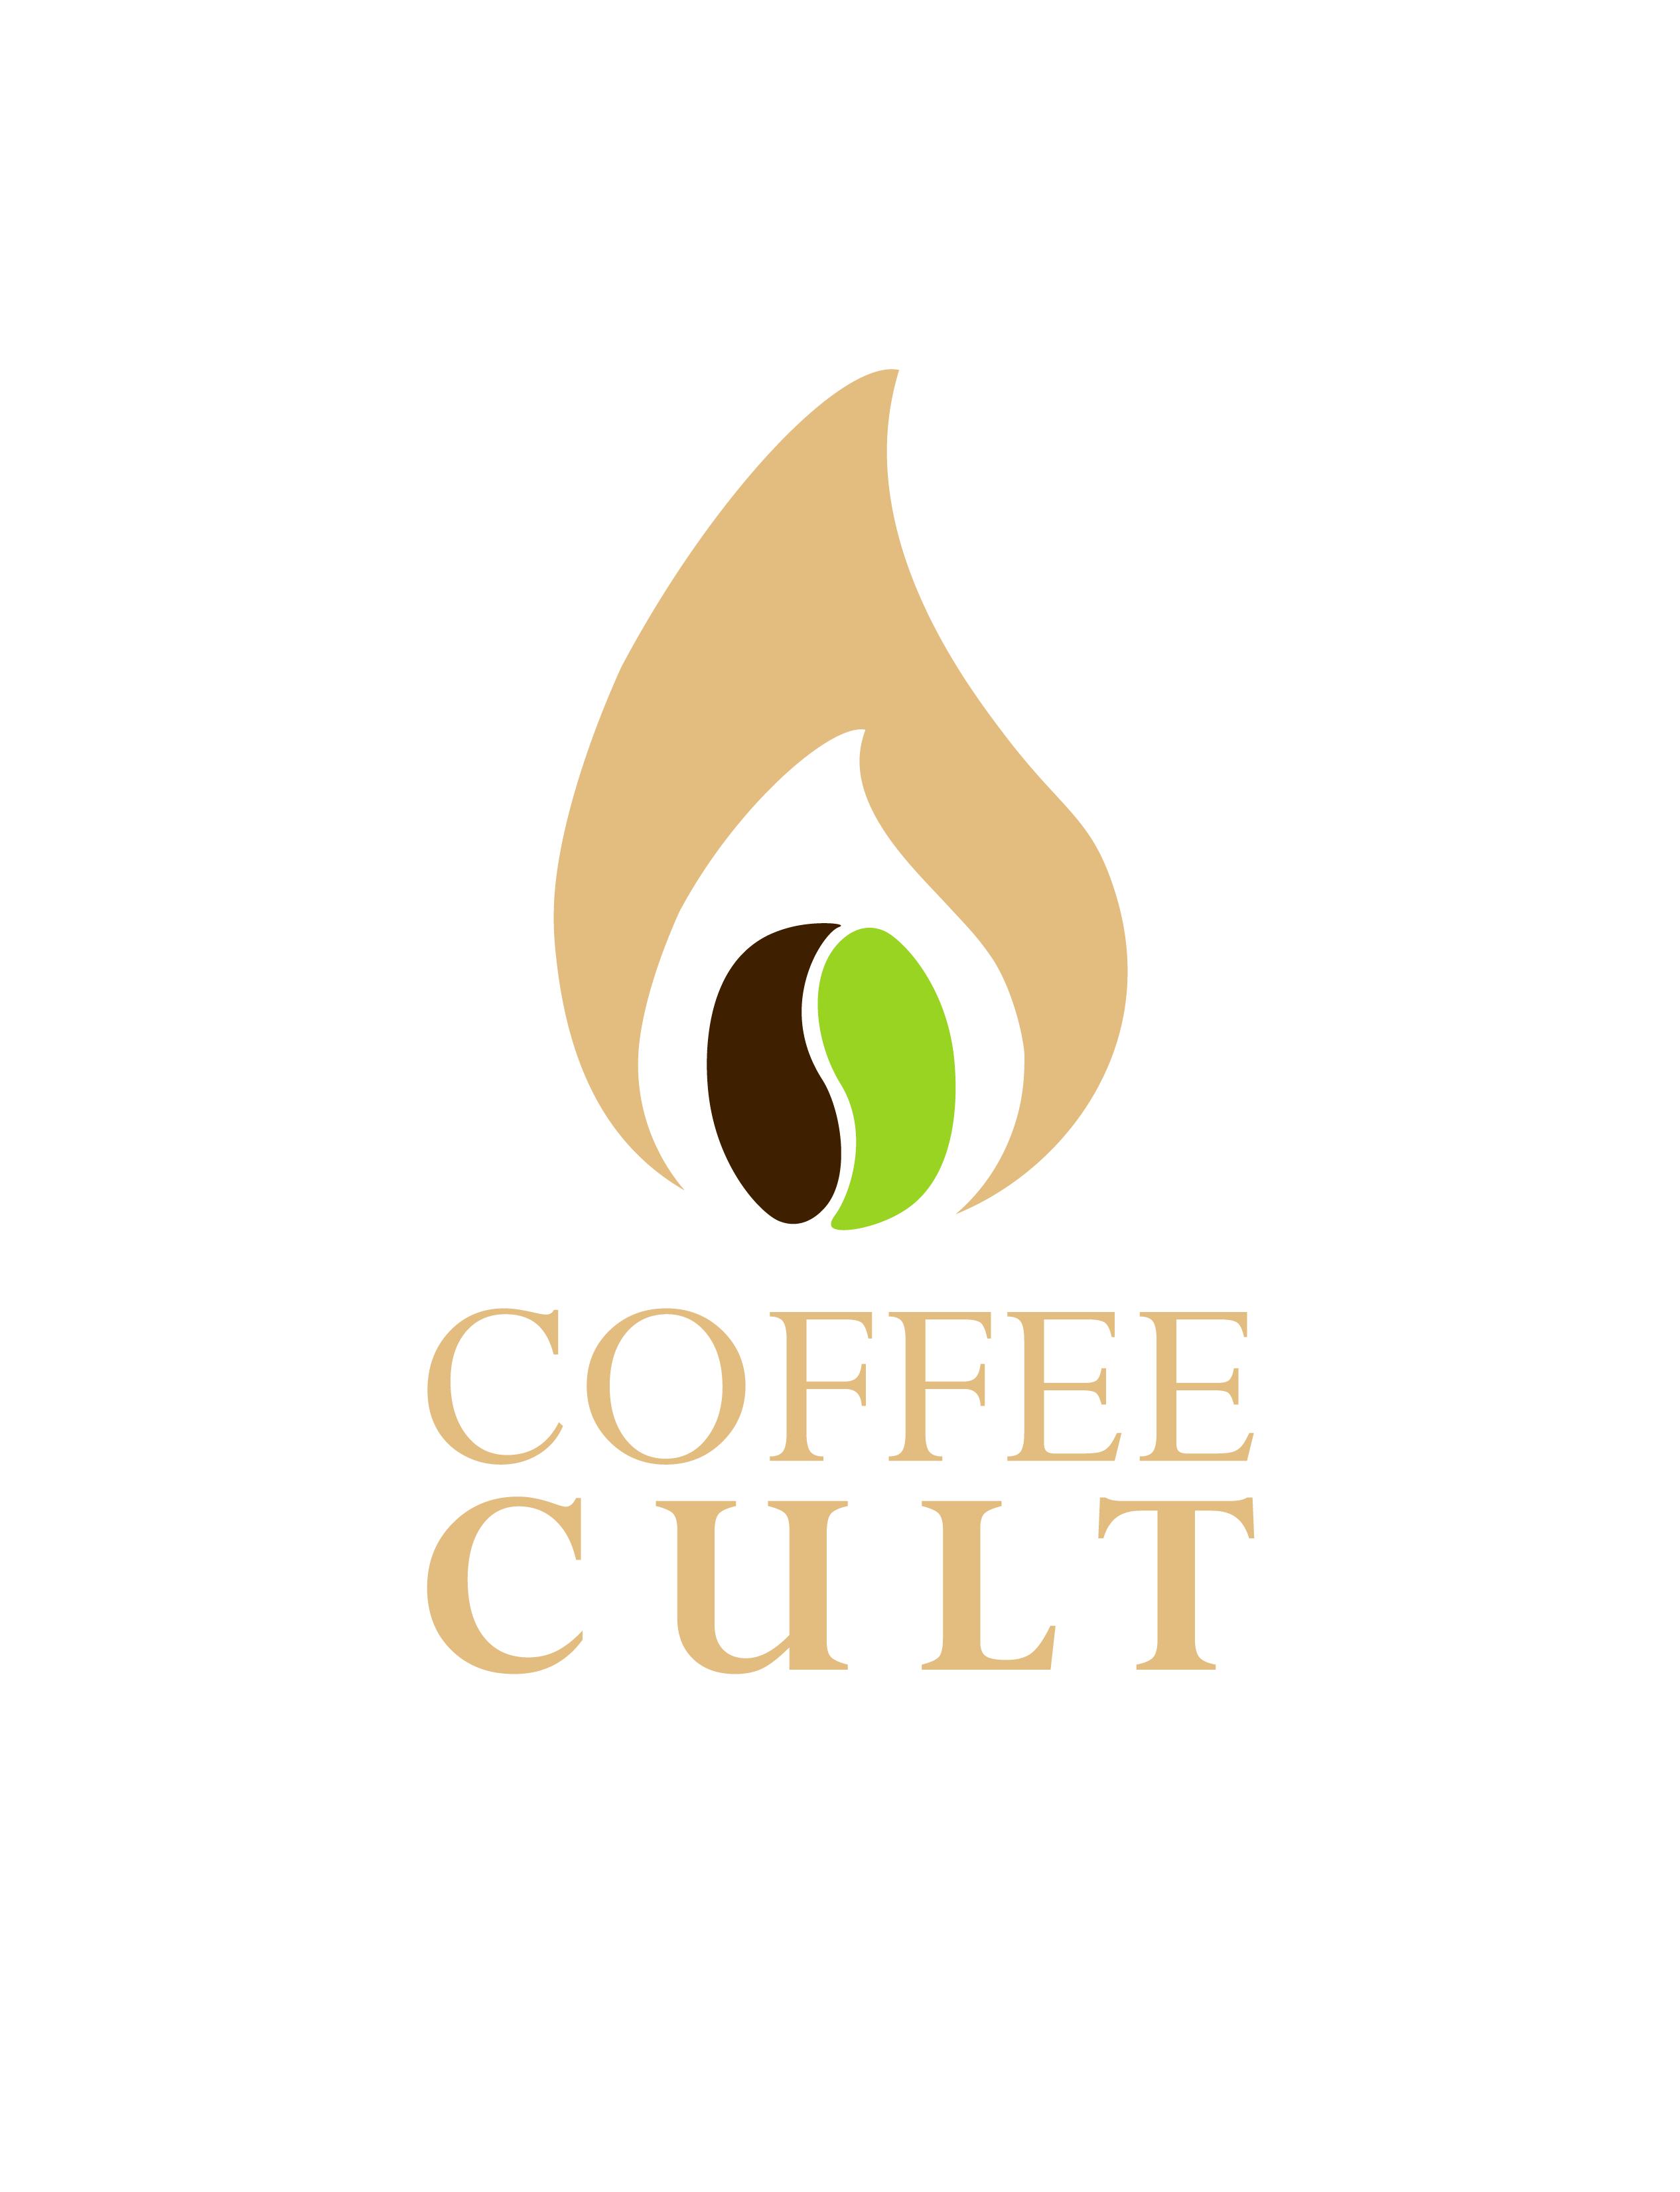 Логотип и фирменный стиль для компании COFFEE CULT фото f_2265bc1ffdf6ae2d.png